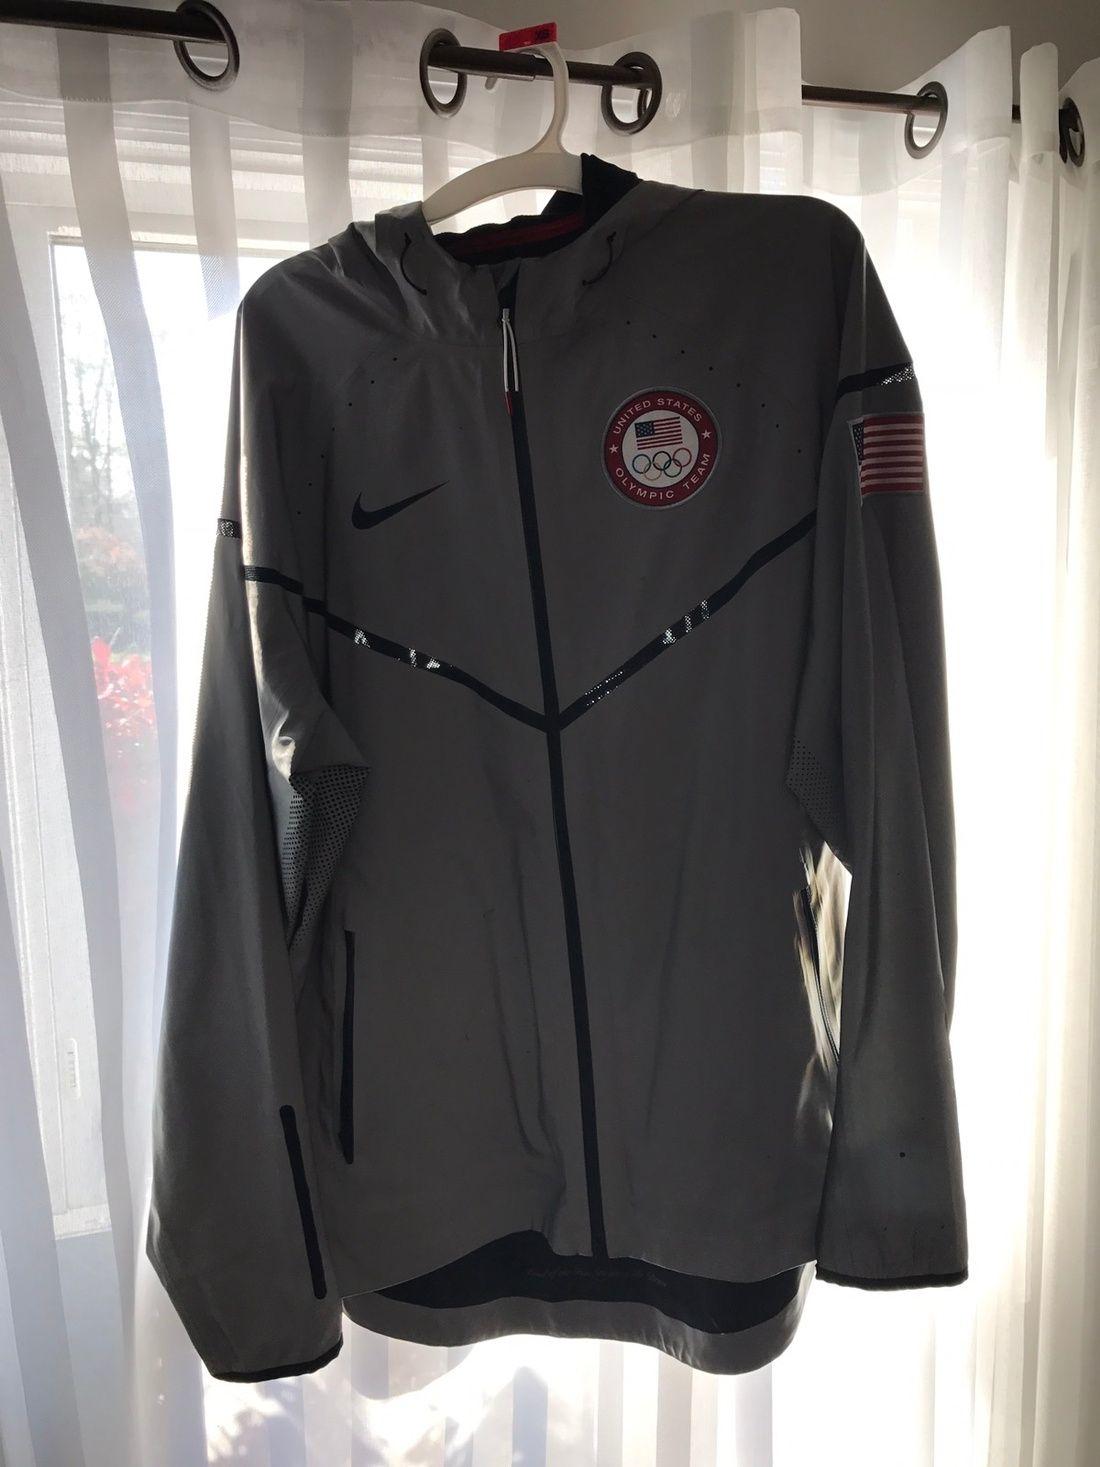 Nike London Olympic 3 M Reflective Team Usa Podium Jacket Size L 294 Nike London Jackets Nike [ 1467 x 1100 Pixel ]